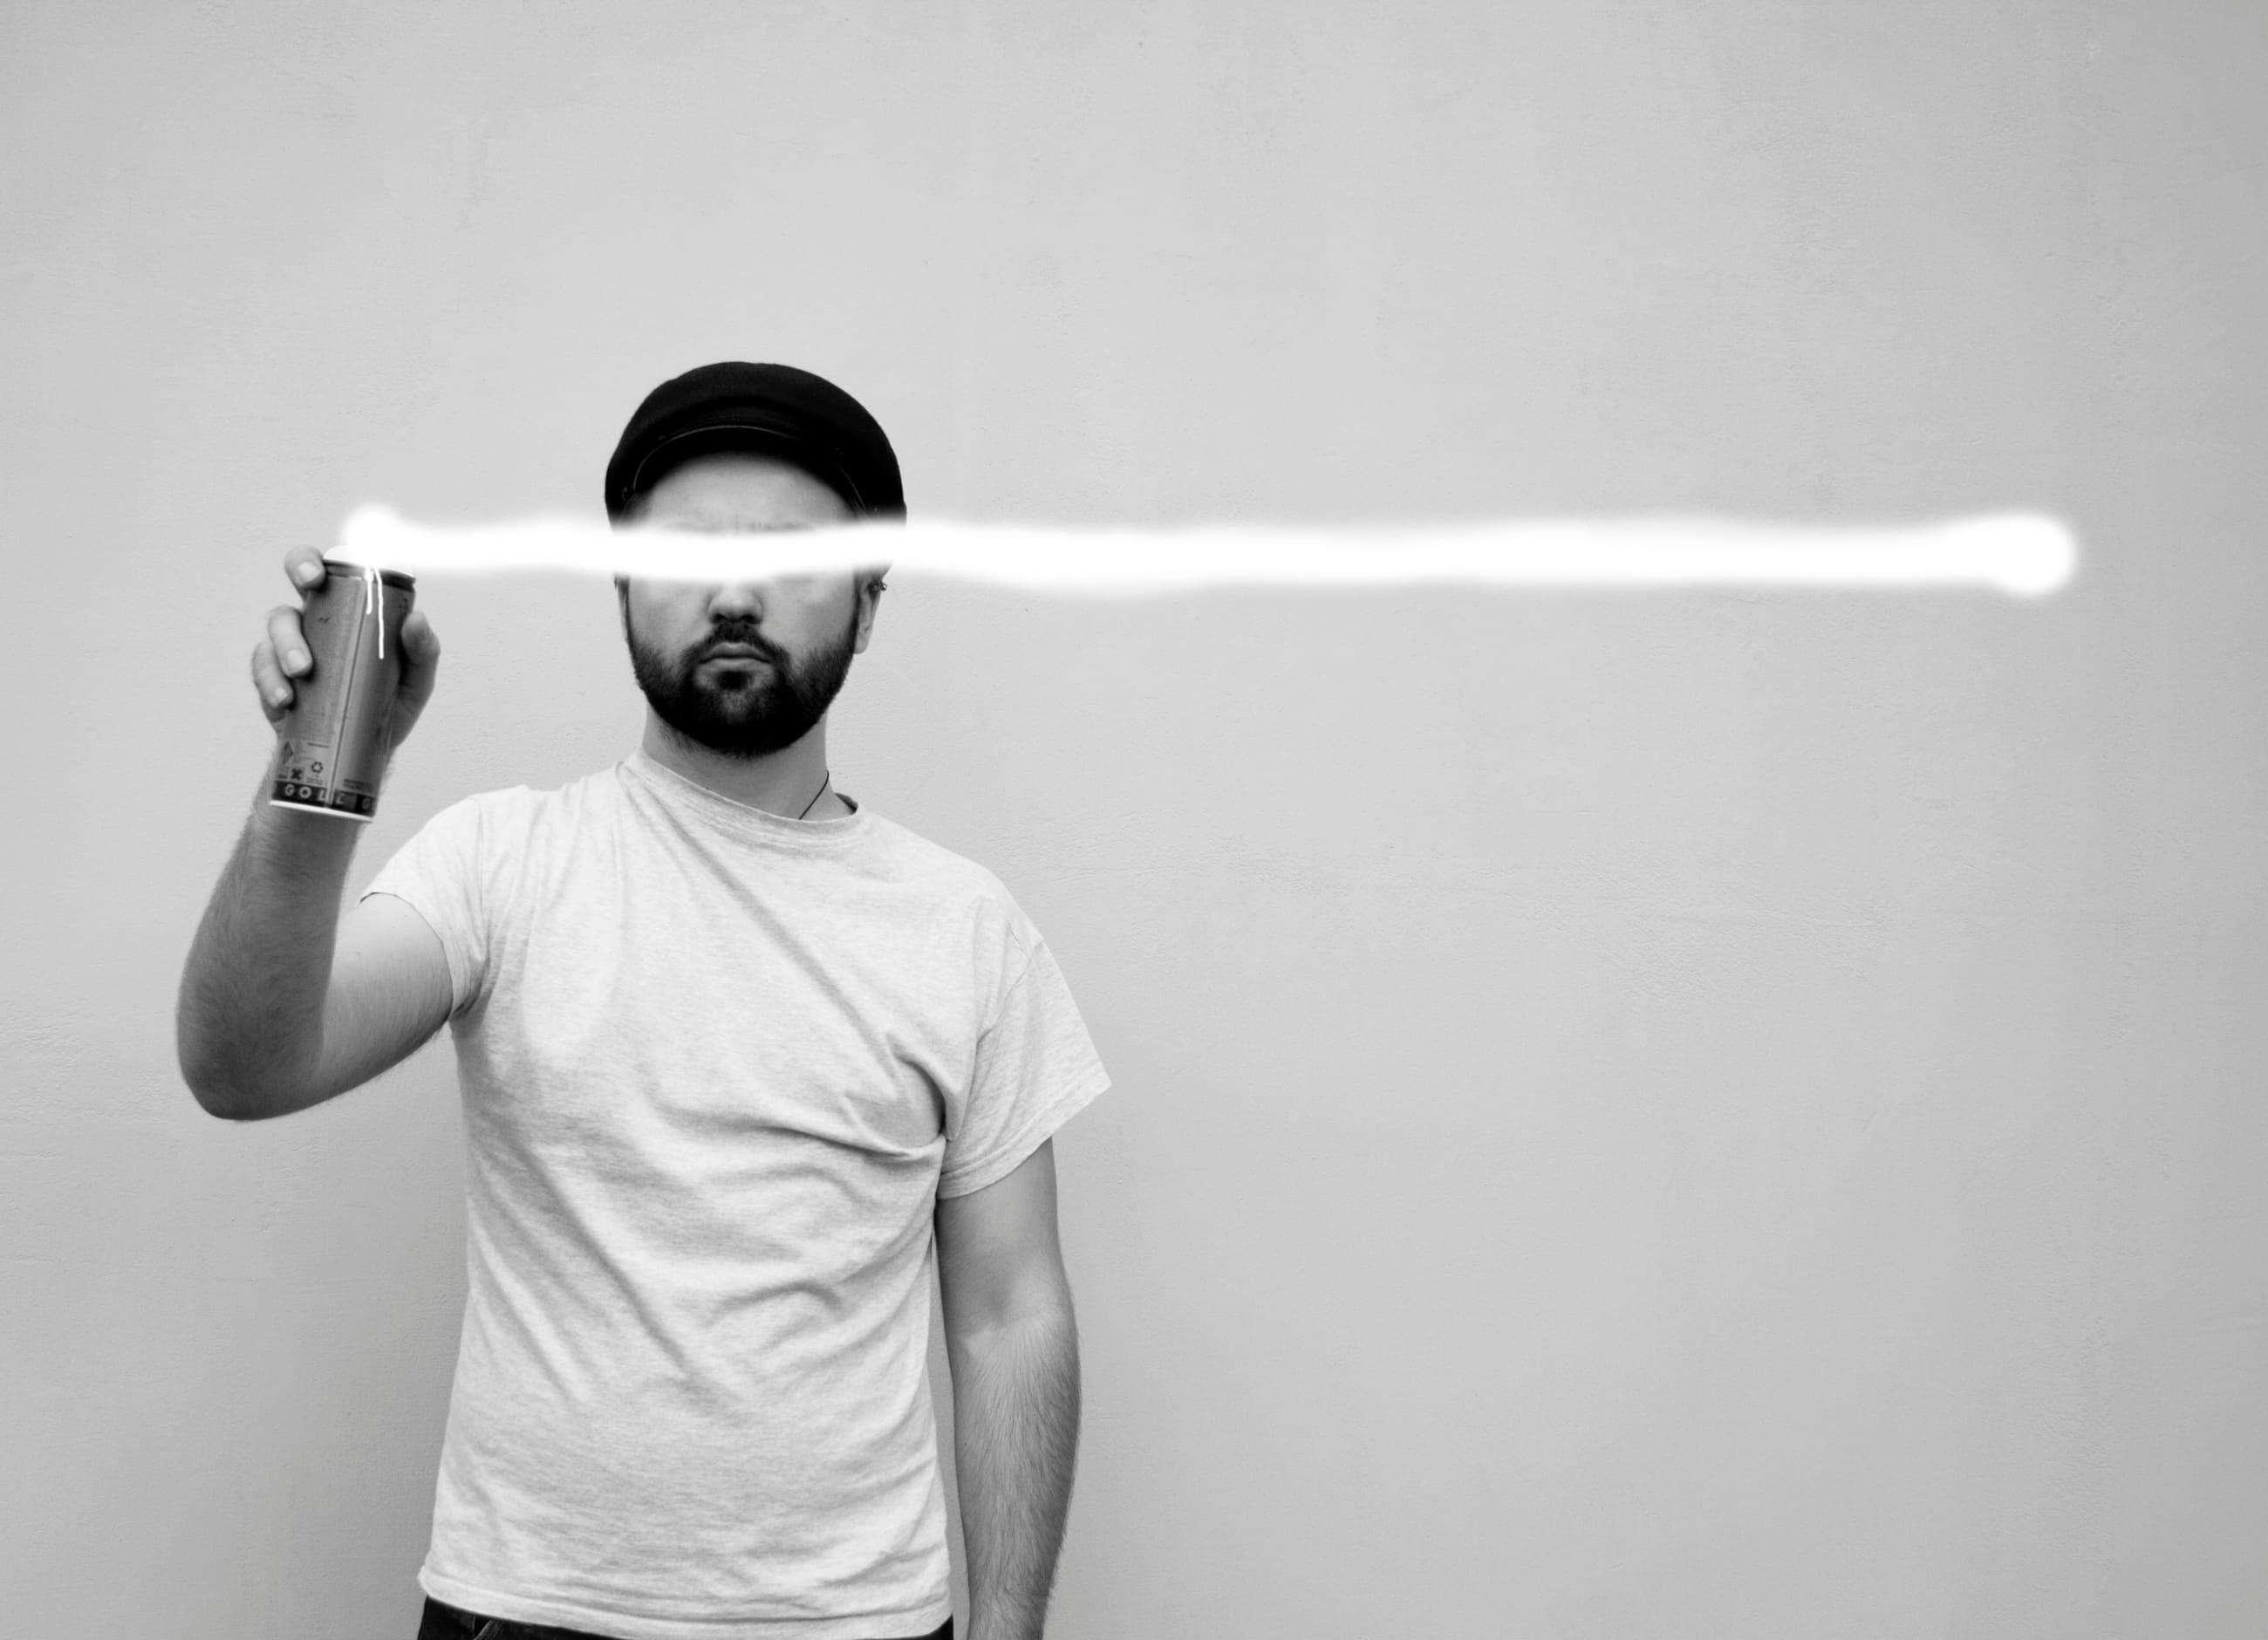 Sasha Kurmaz, Self-Portrait, 2012